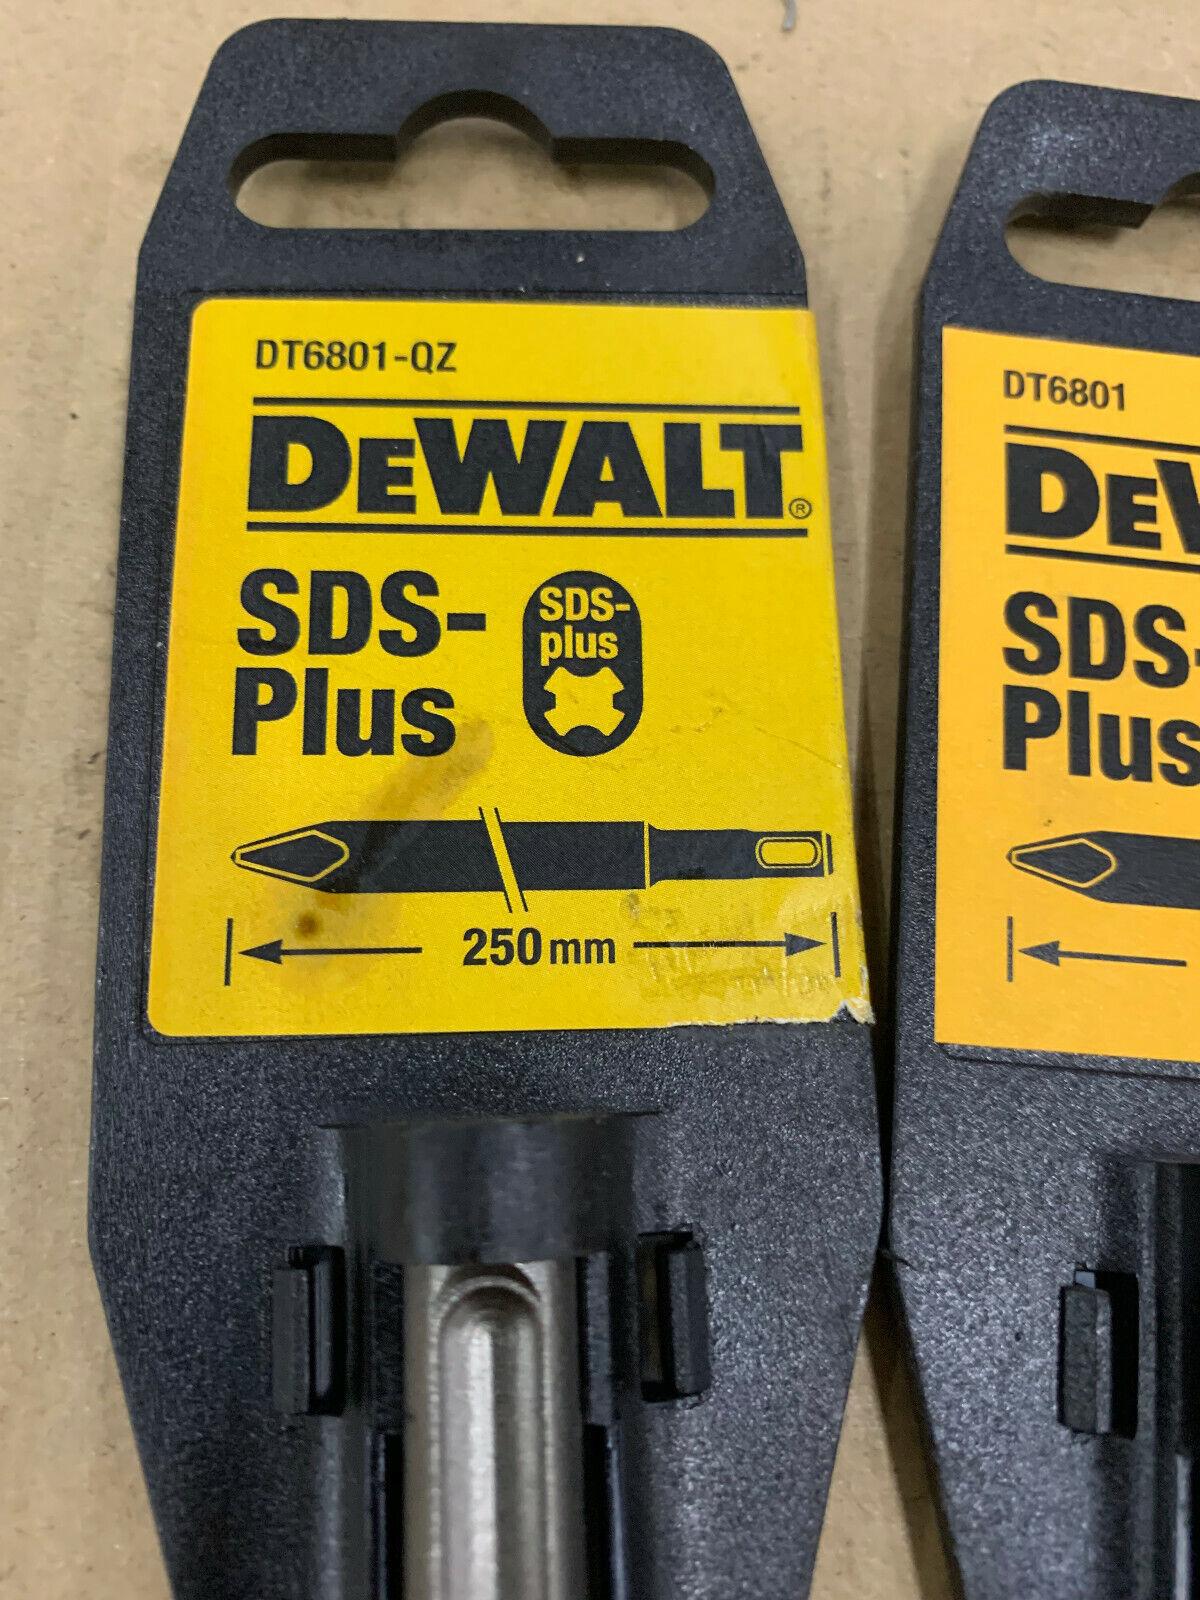 Dewalt SDS-Plus Spitzmeisel Flachmeisel Spatmeisel DT6801 DT6802 DT6803 DT60330